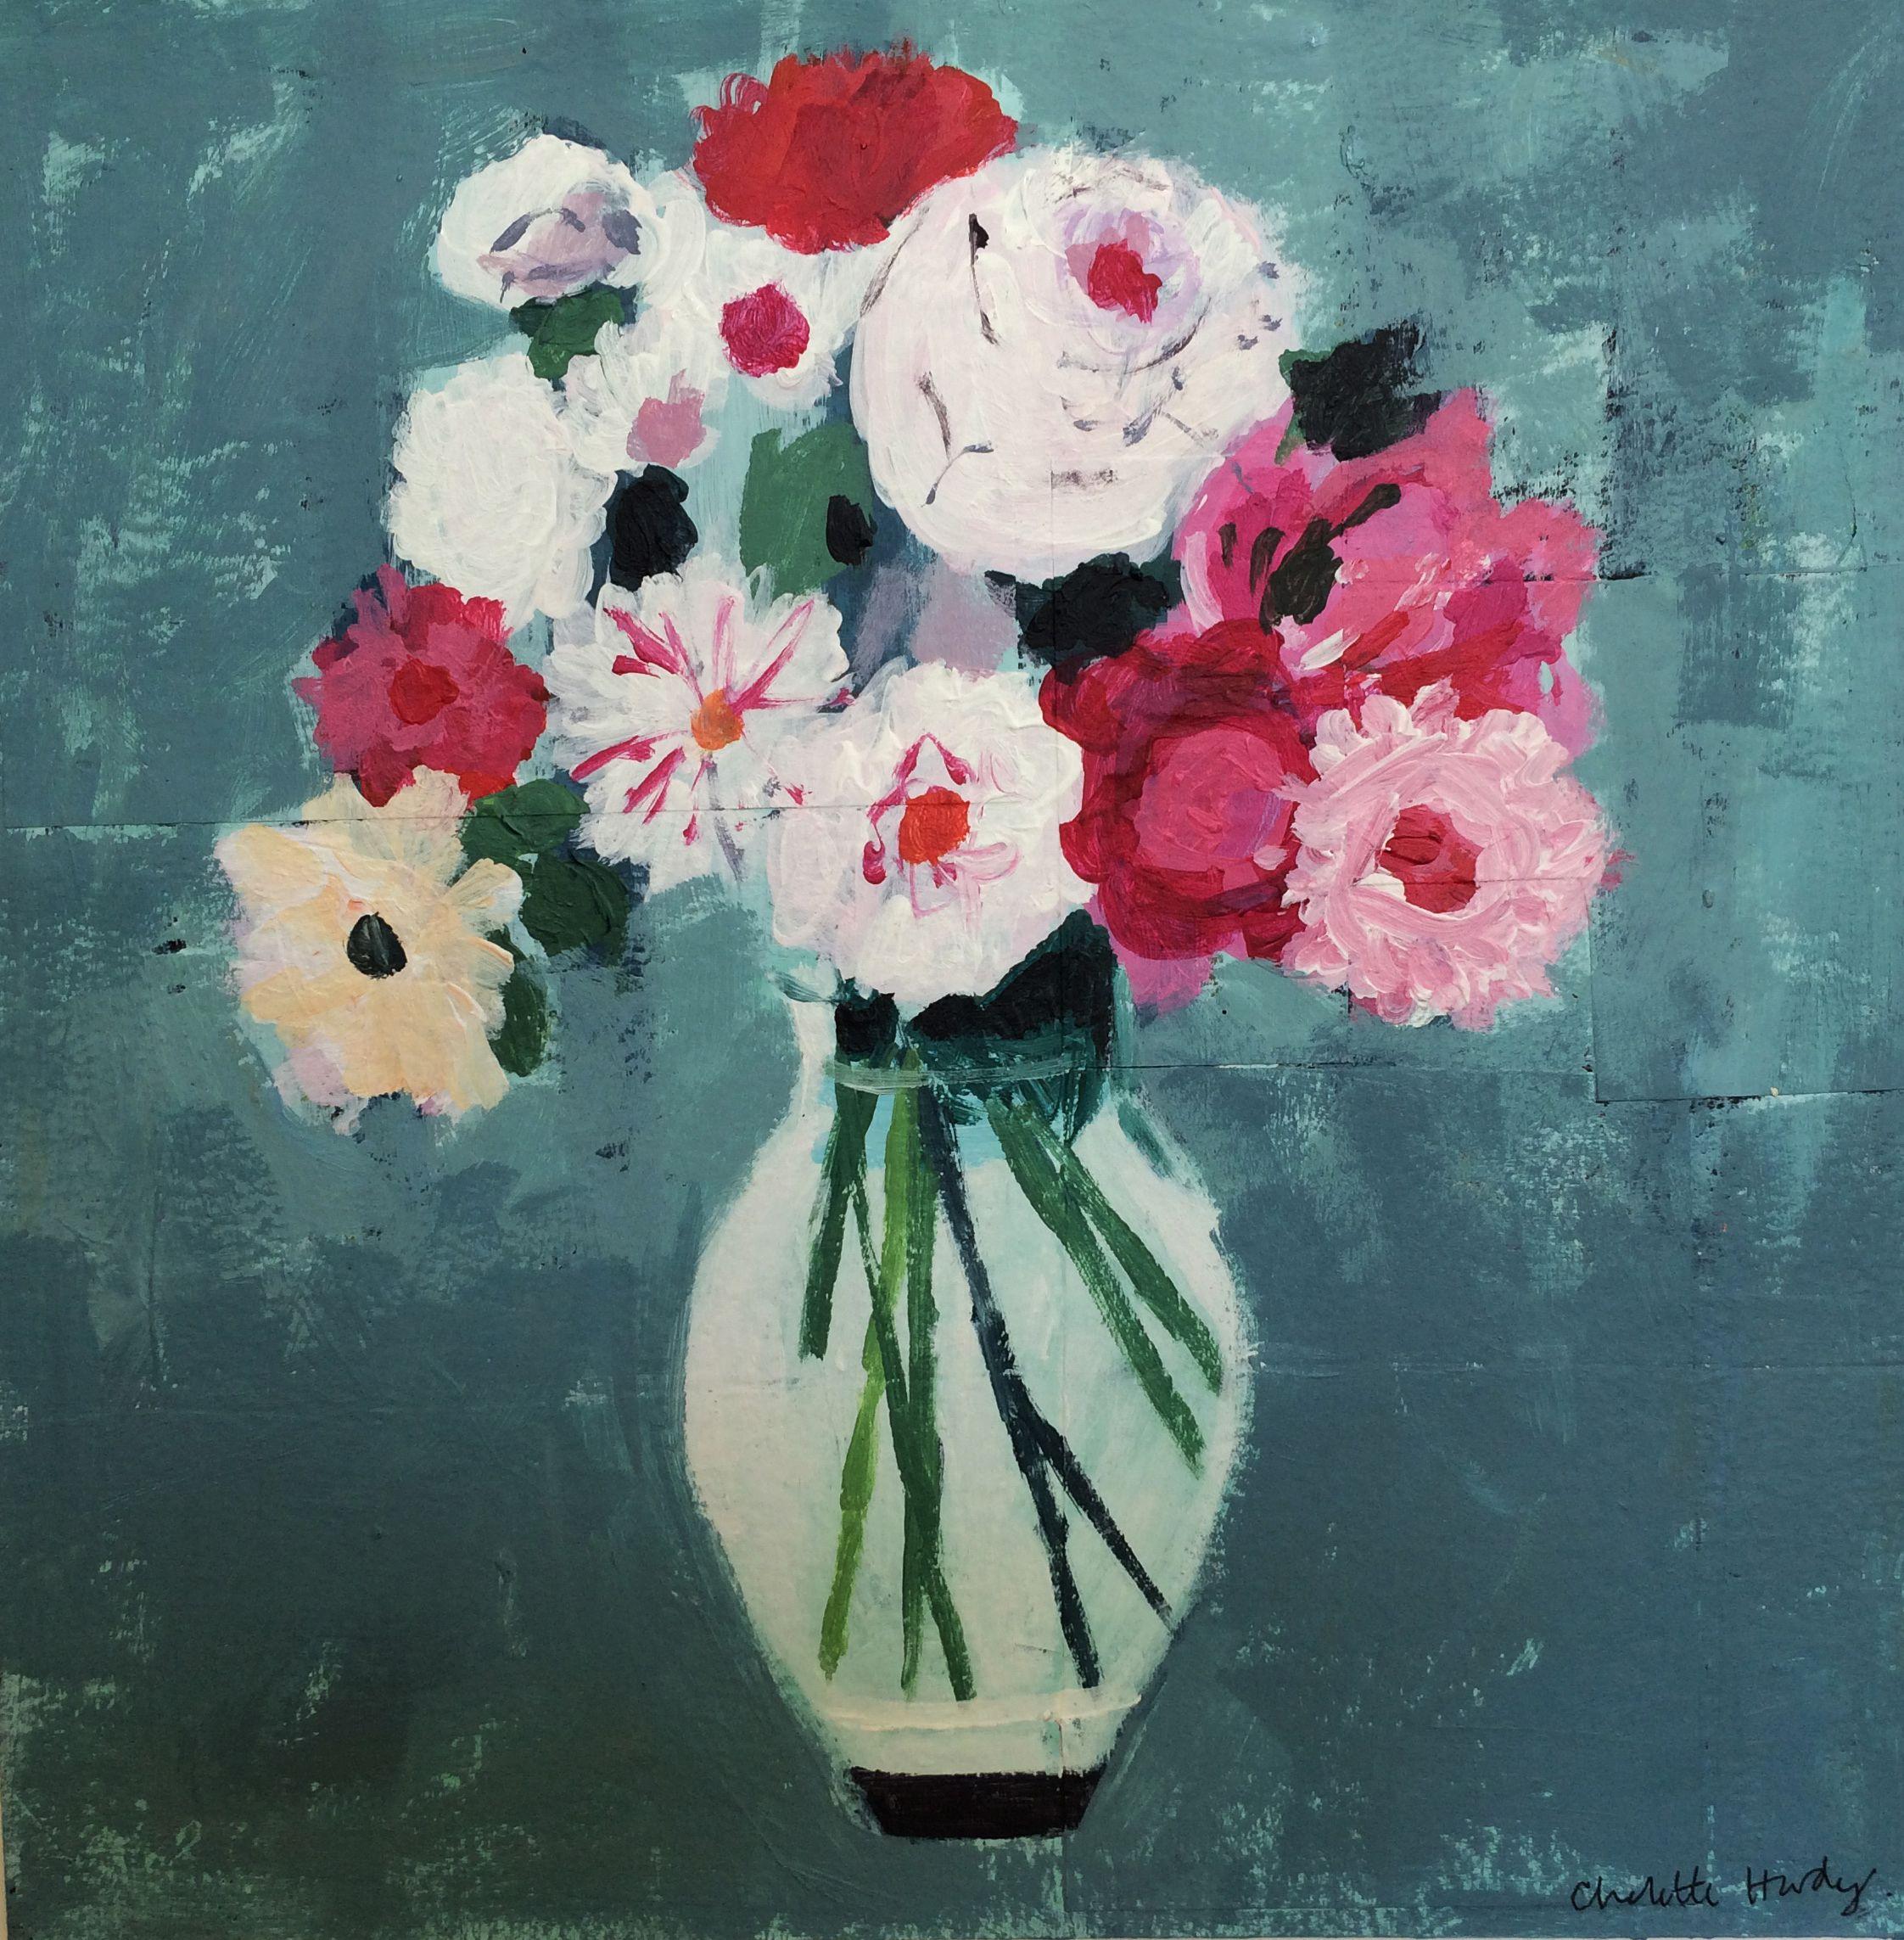 Kitchen Garden | art | Pinterest | Charlotte, Acrylics and Prints